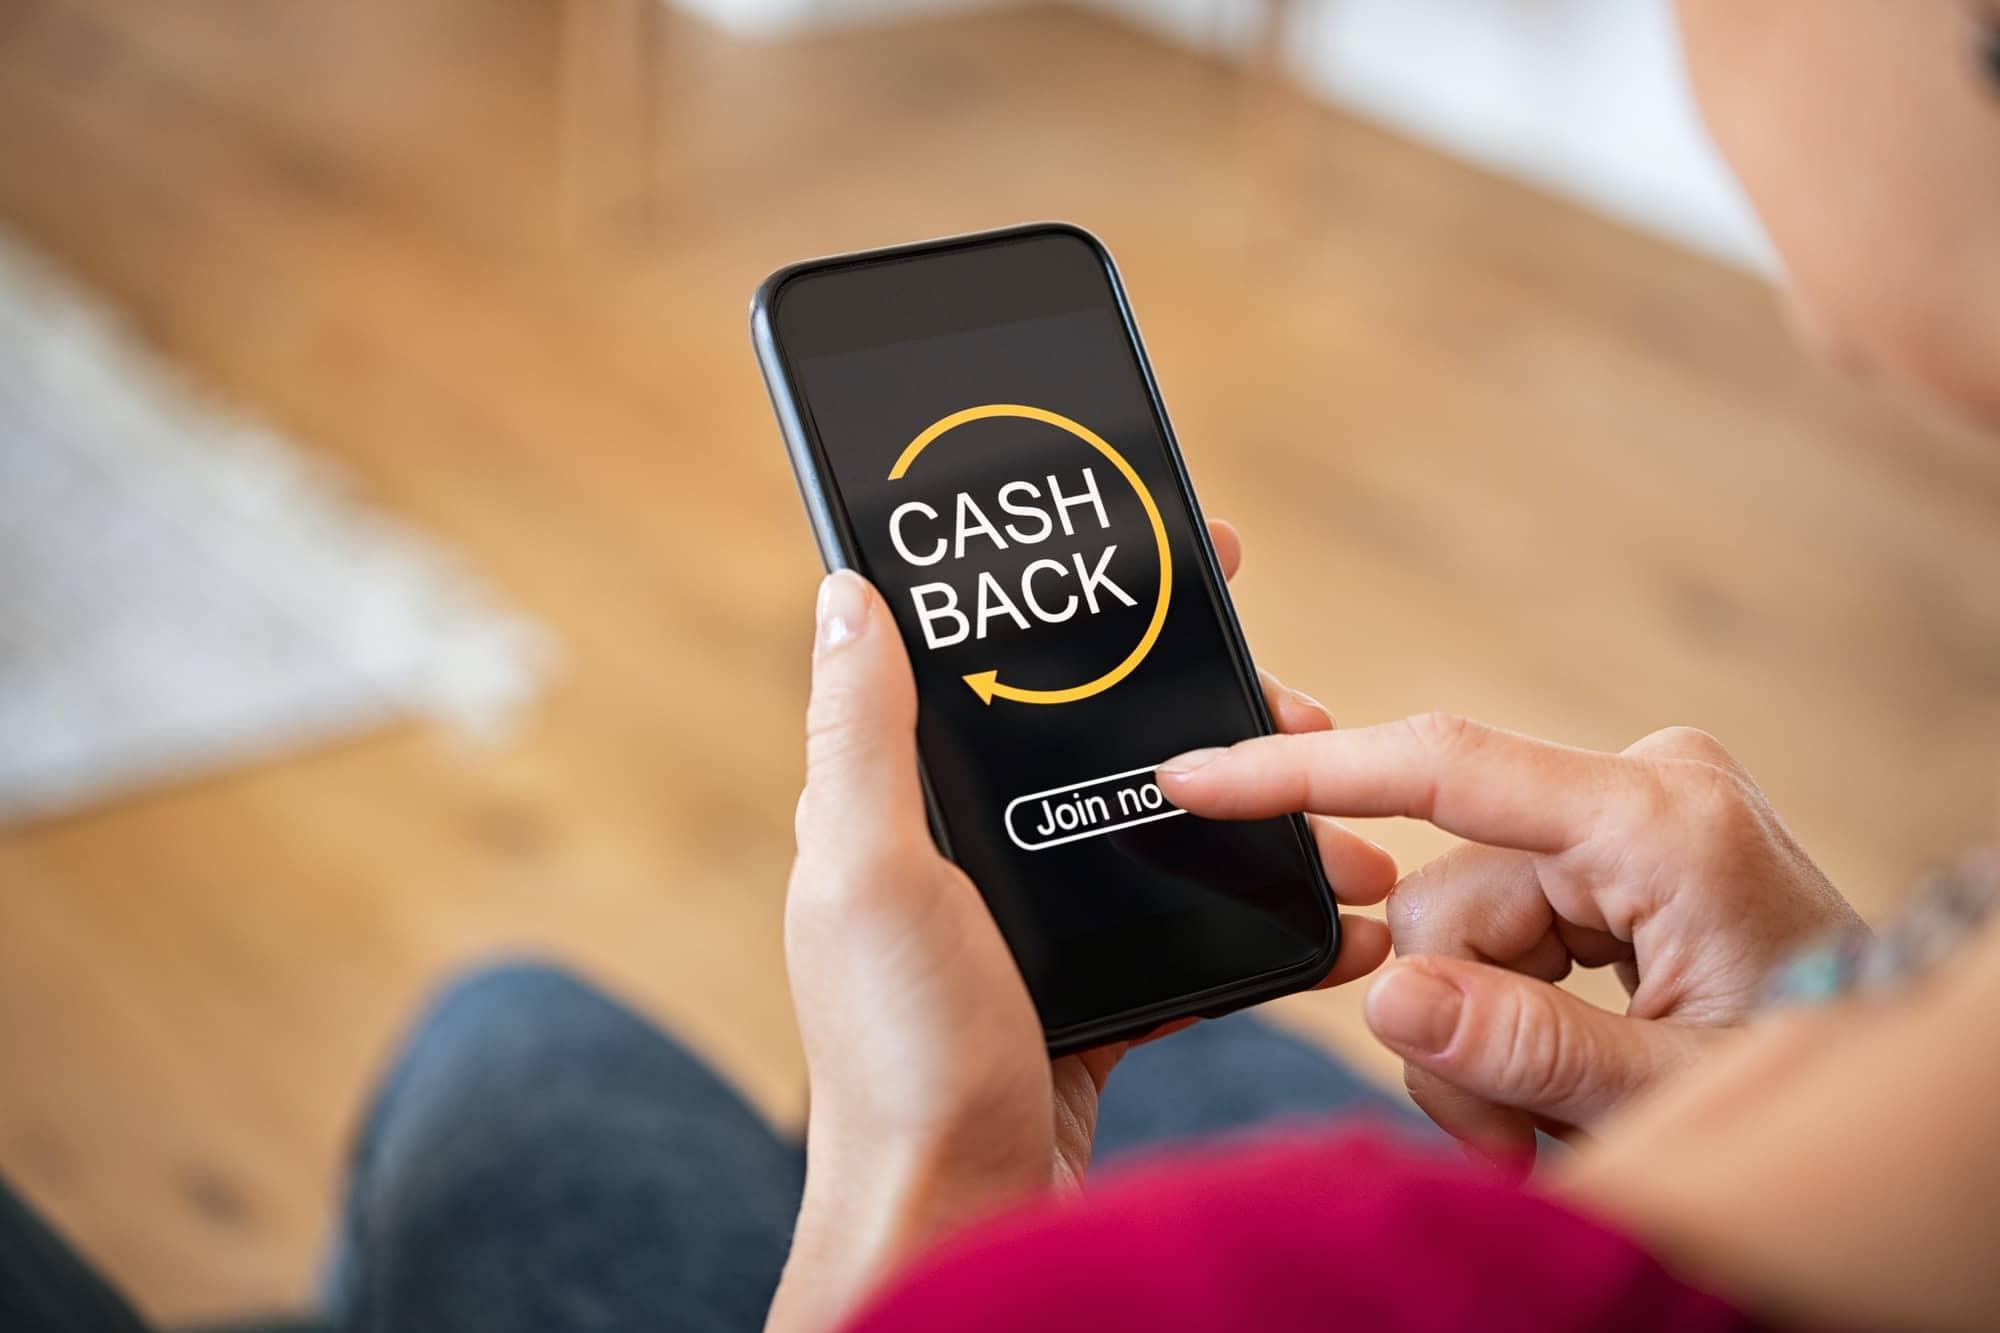 Come funziona il cashback Come funziona il cashback